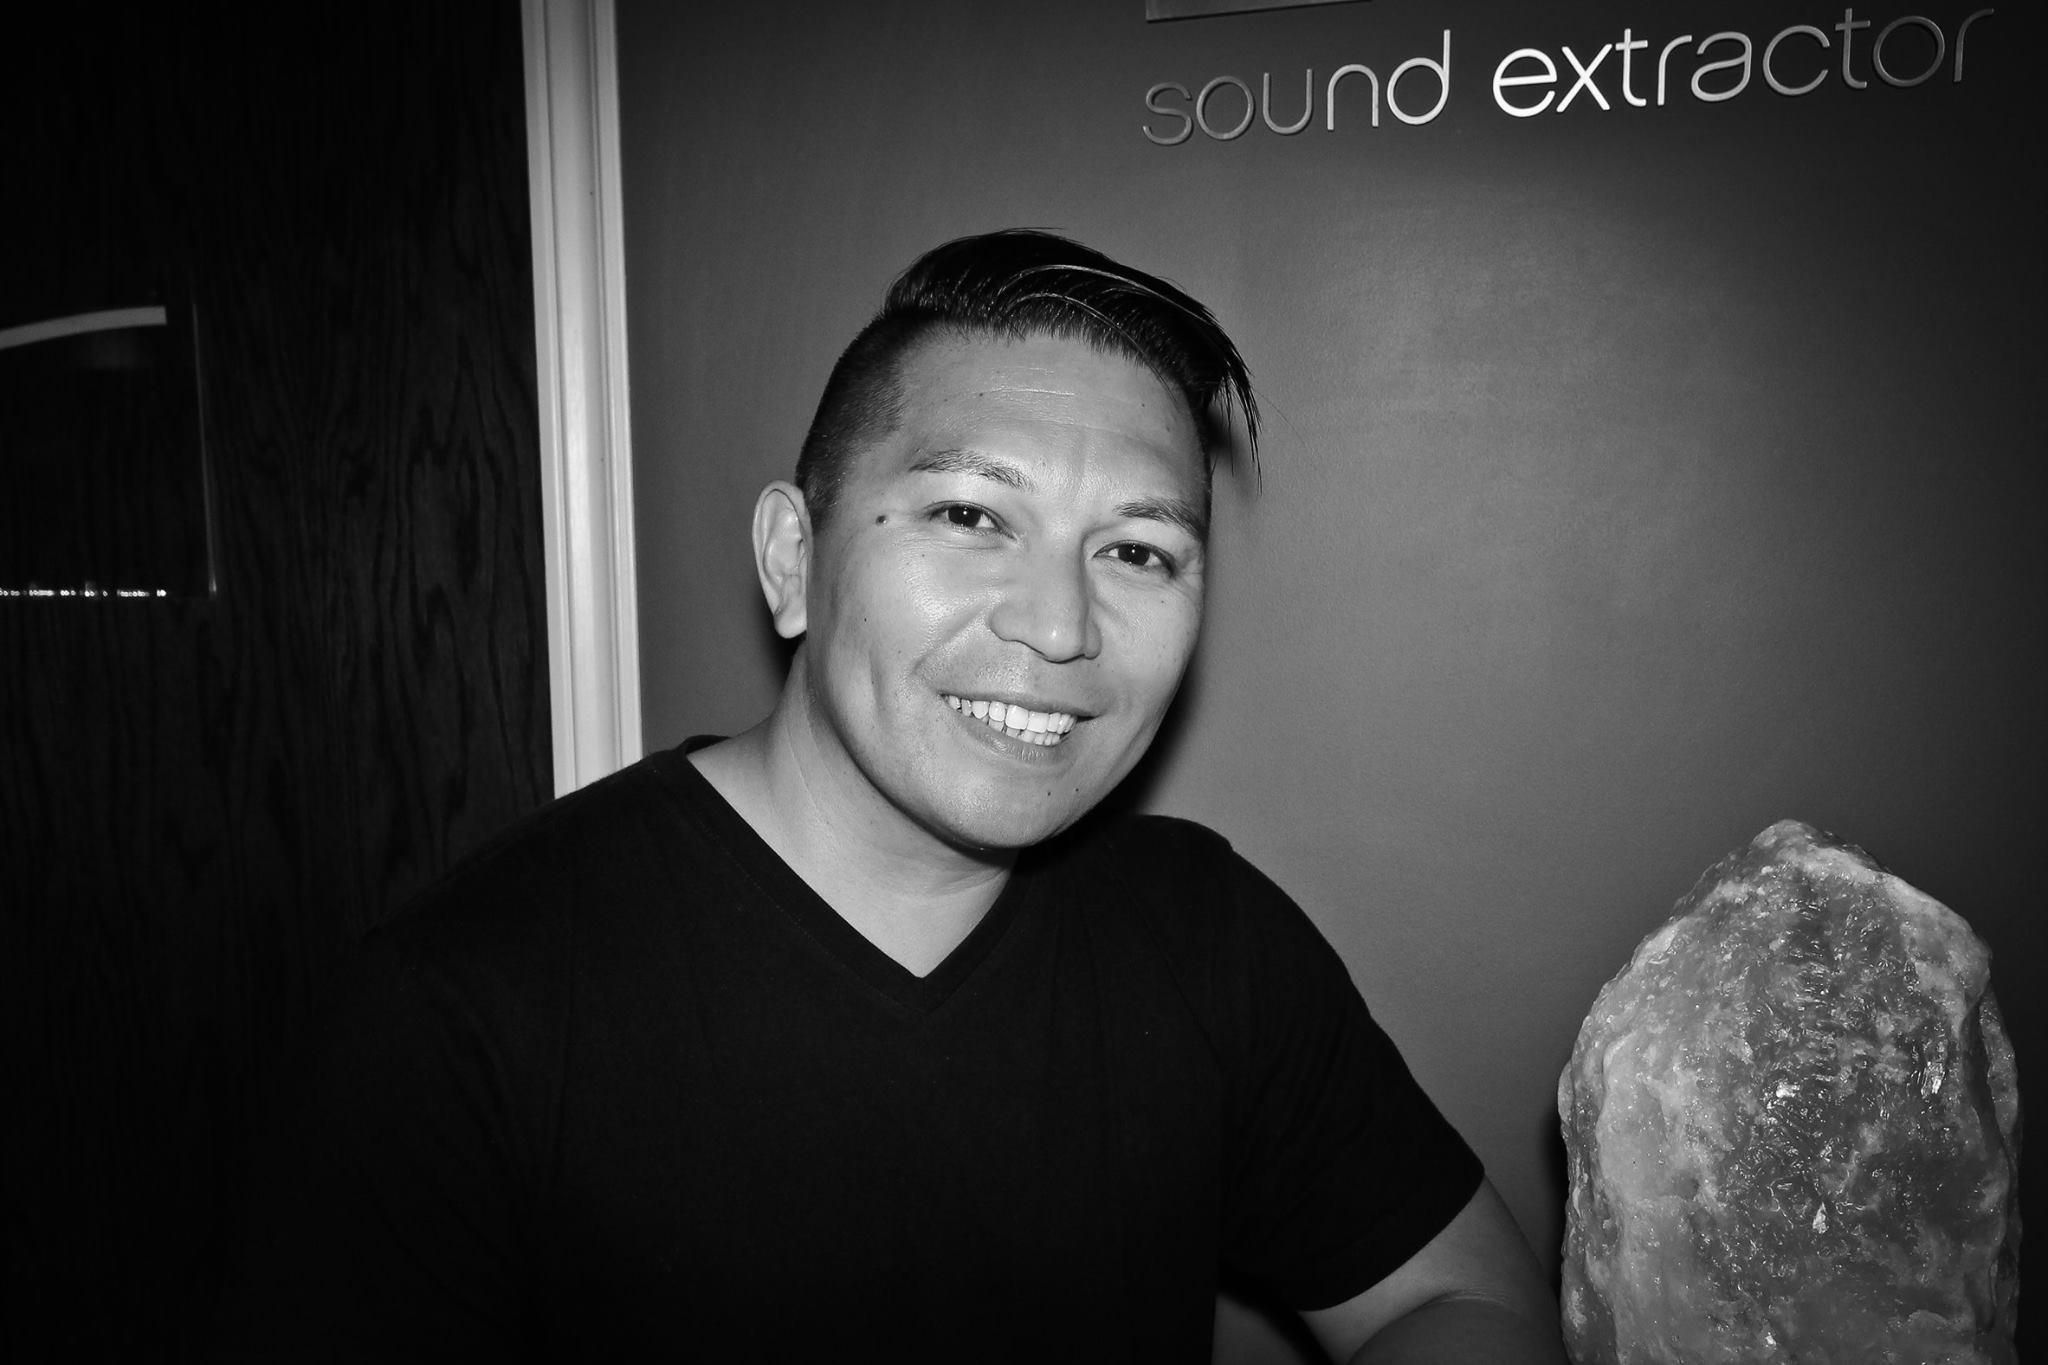 S.A.C. Writing Camp Edmonton @ Sound Extractor Studios